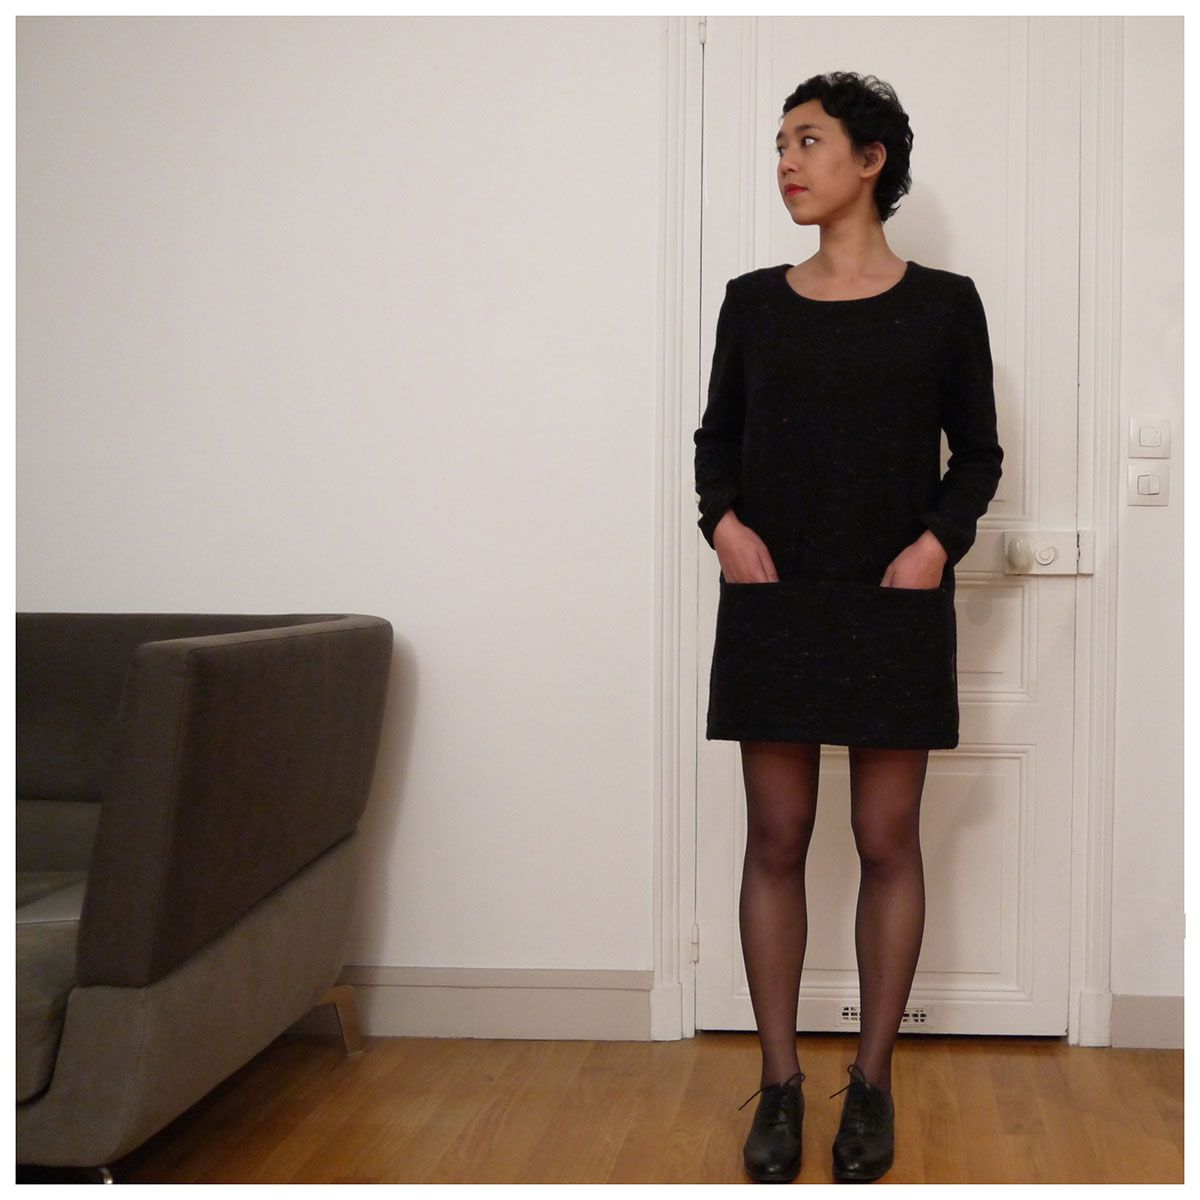 Petite robe facile a porter